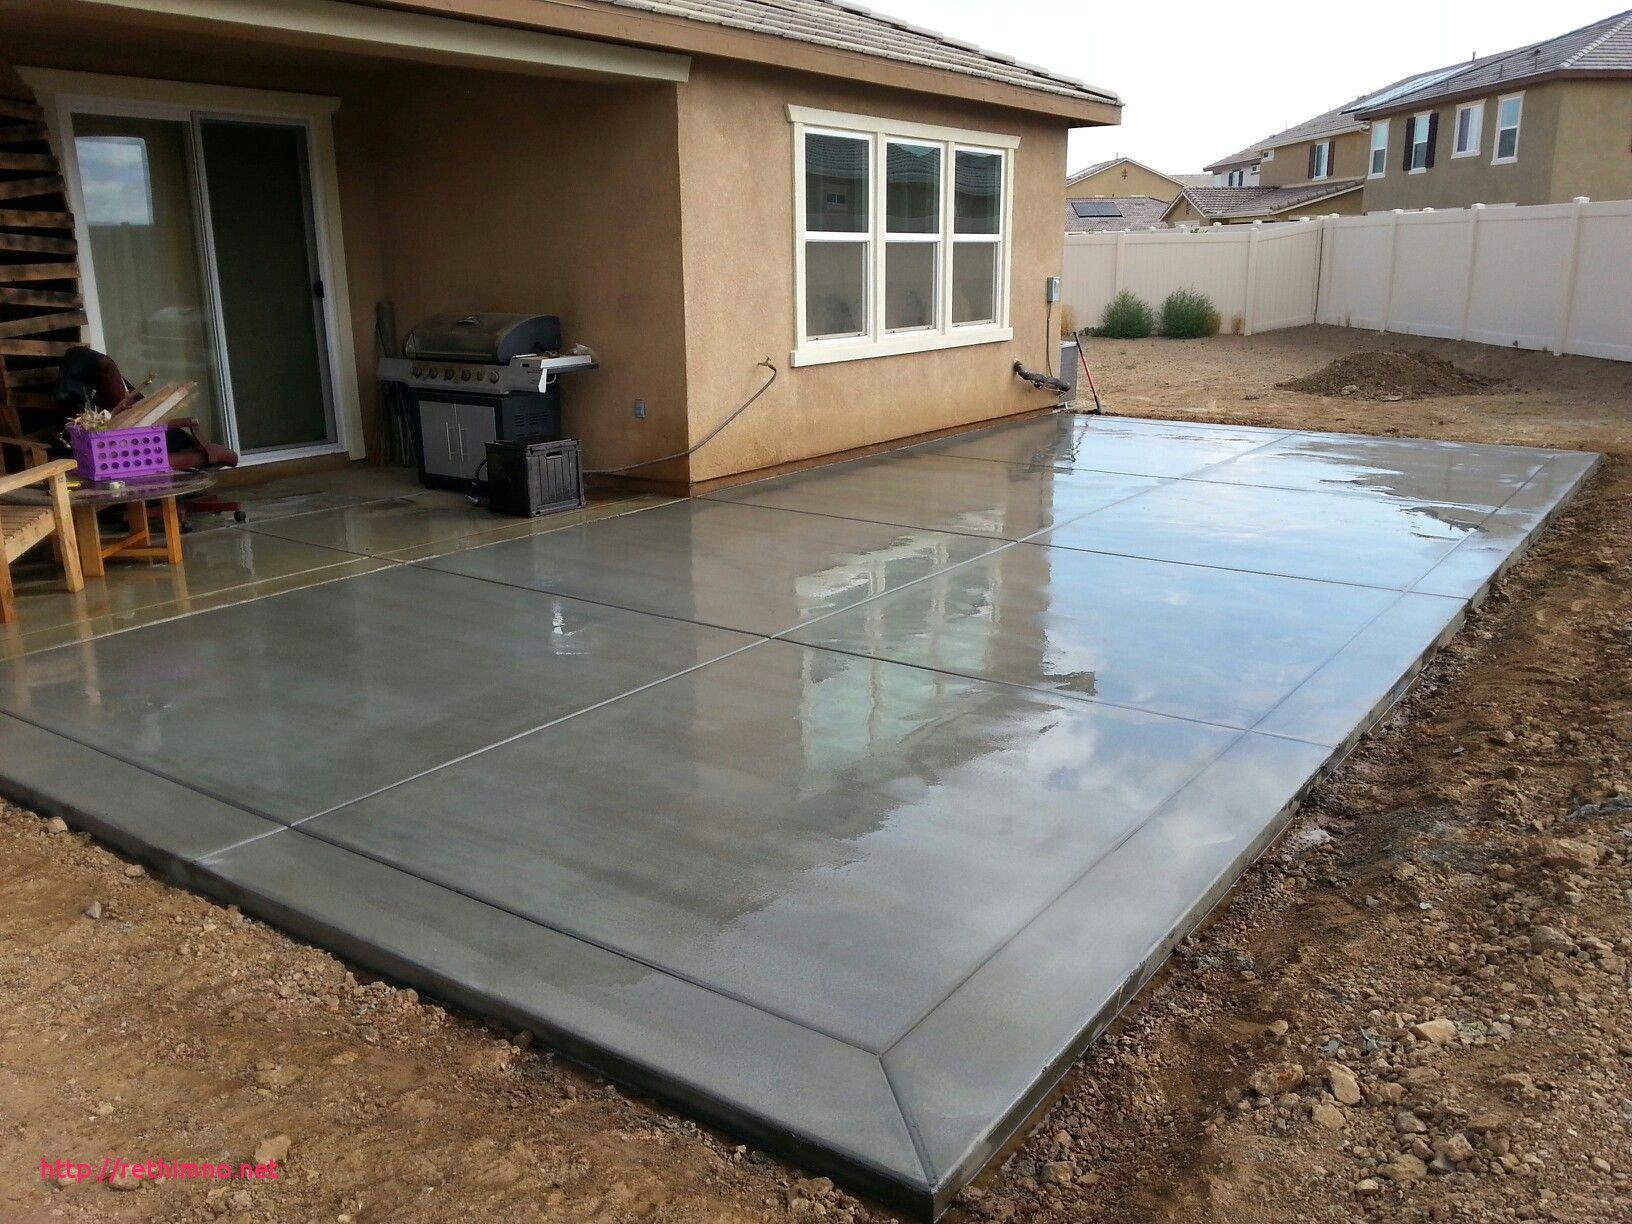 16 Backyard Concrete ideas Most Enchanting and Also Lit ... on Concrete Slab Patio Ideas id=67573